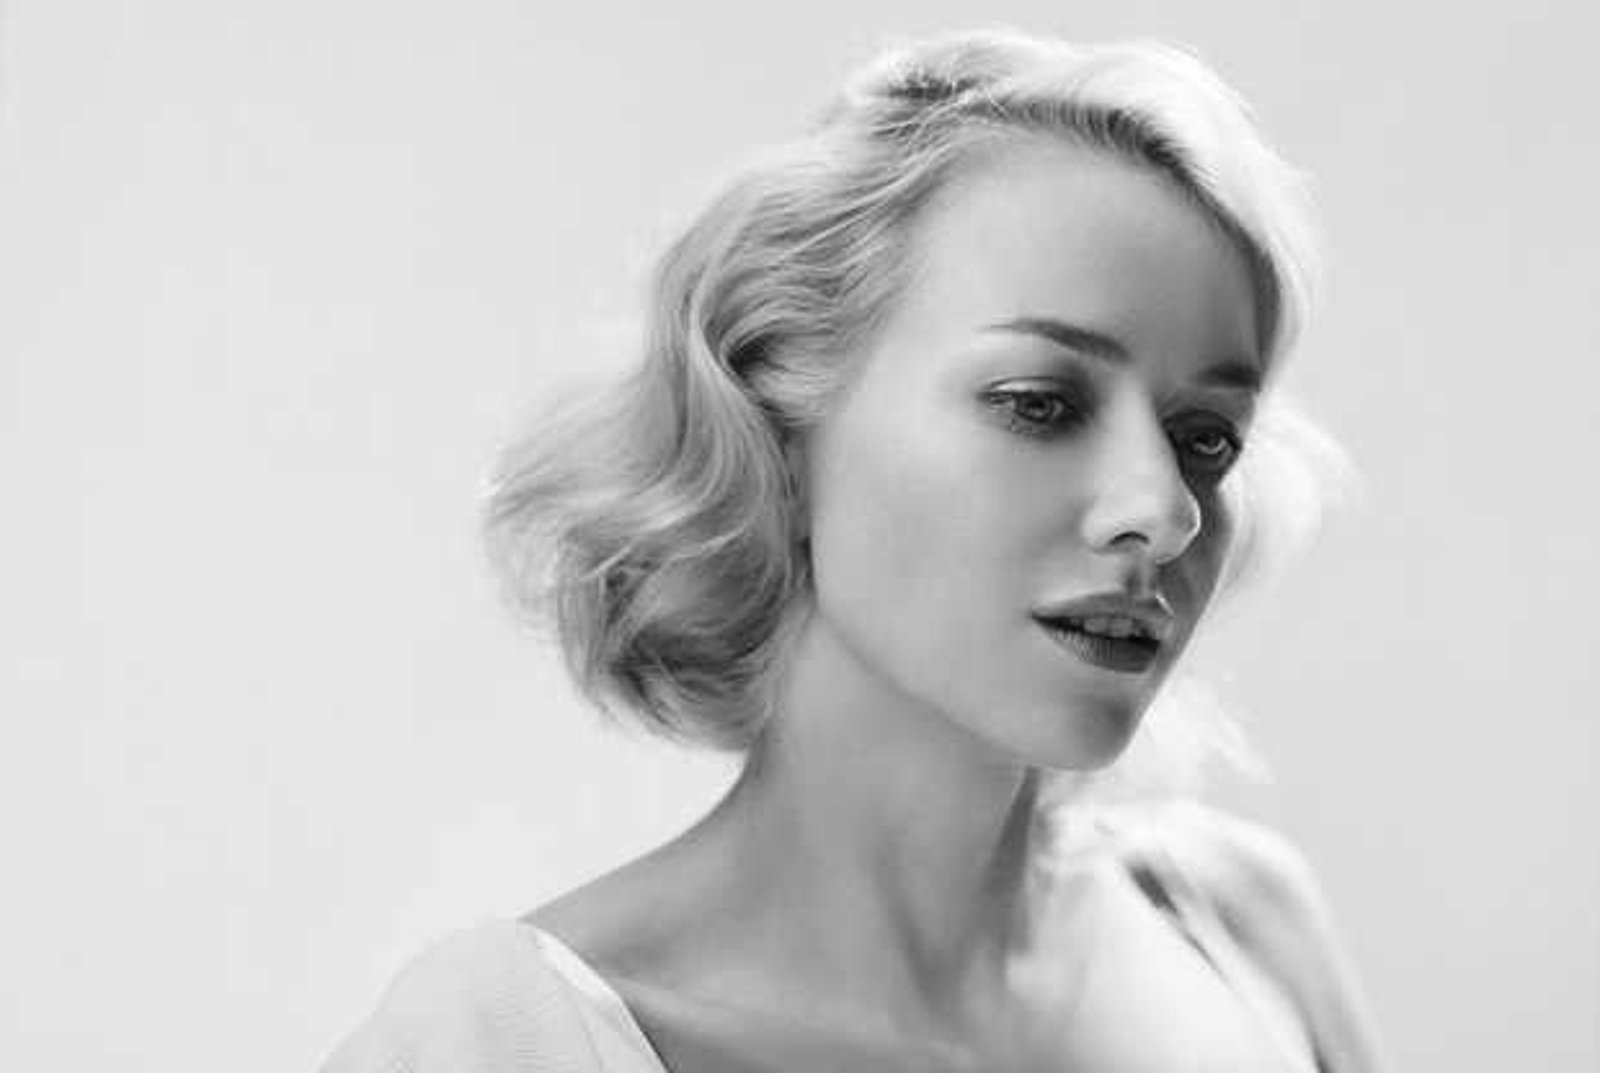 Naomi Watts - Art Streiber